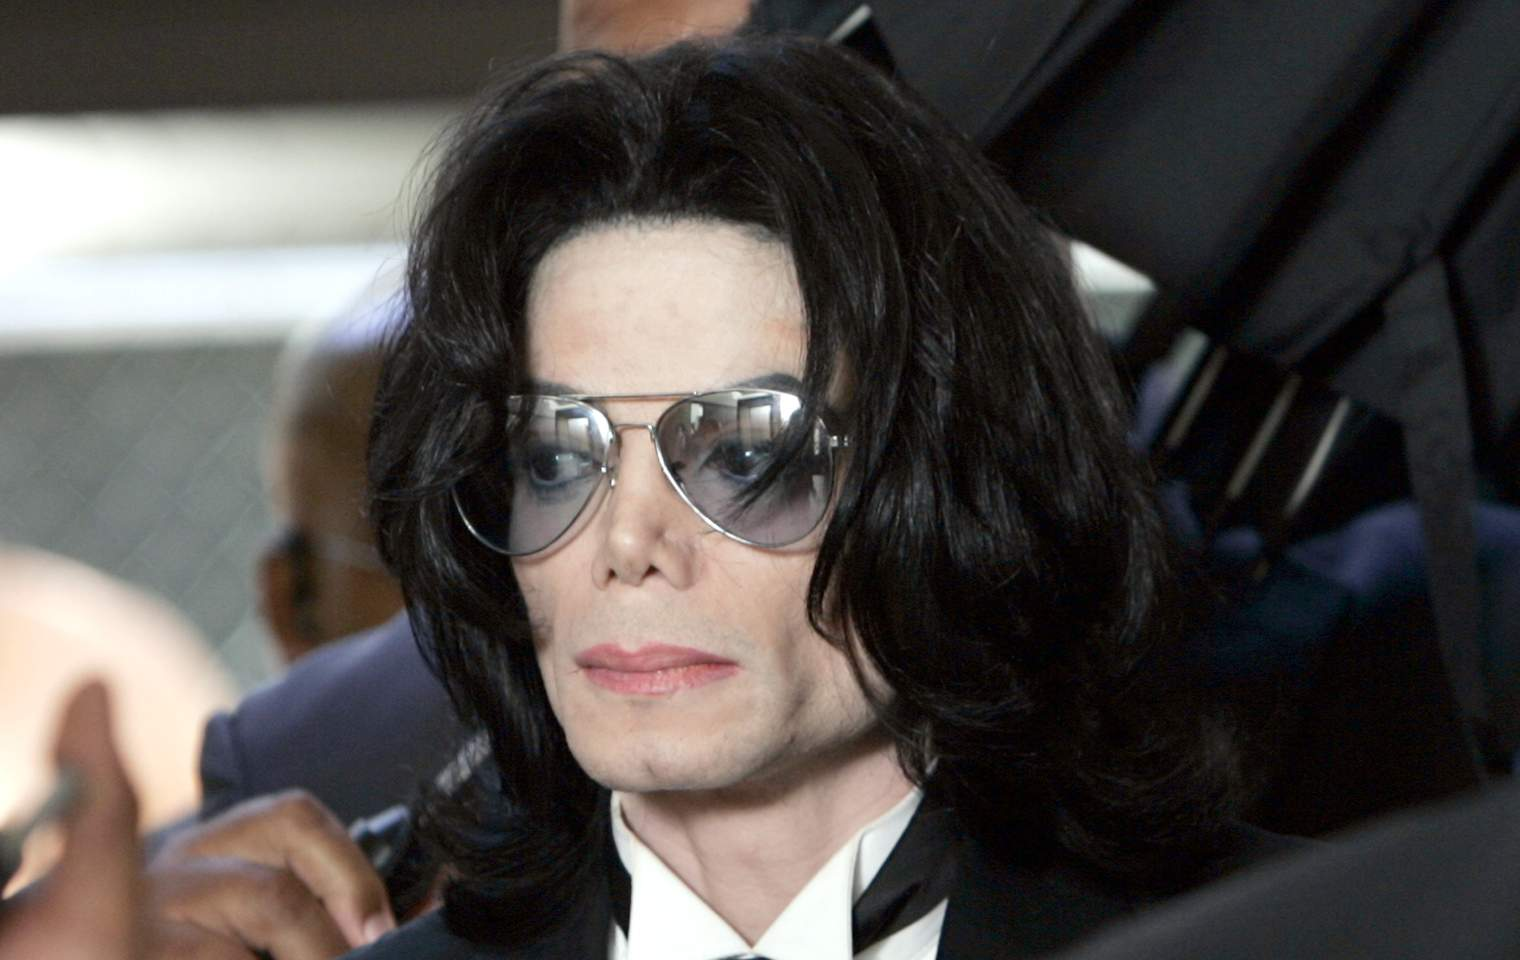 Lebt michael noch jackson Michael Jackson: